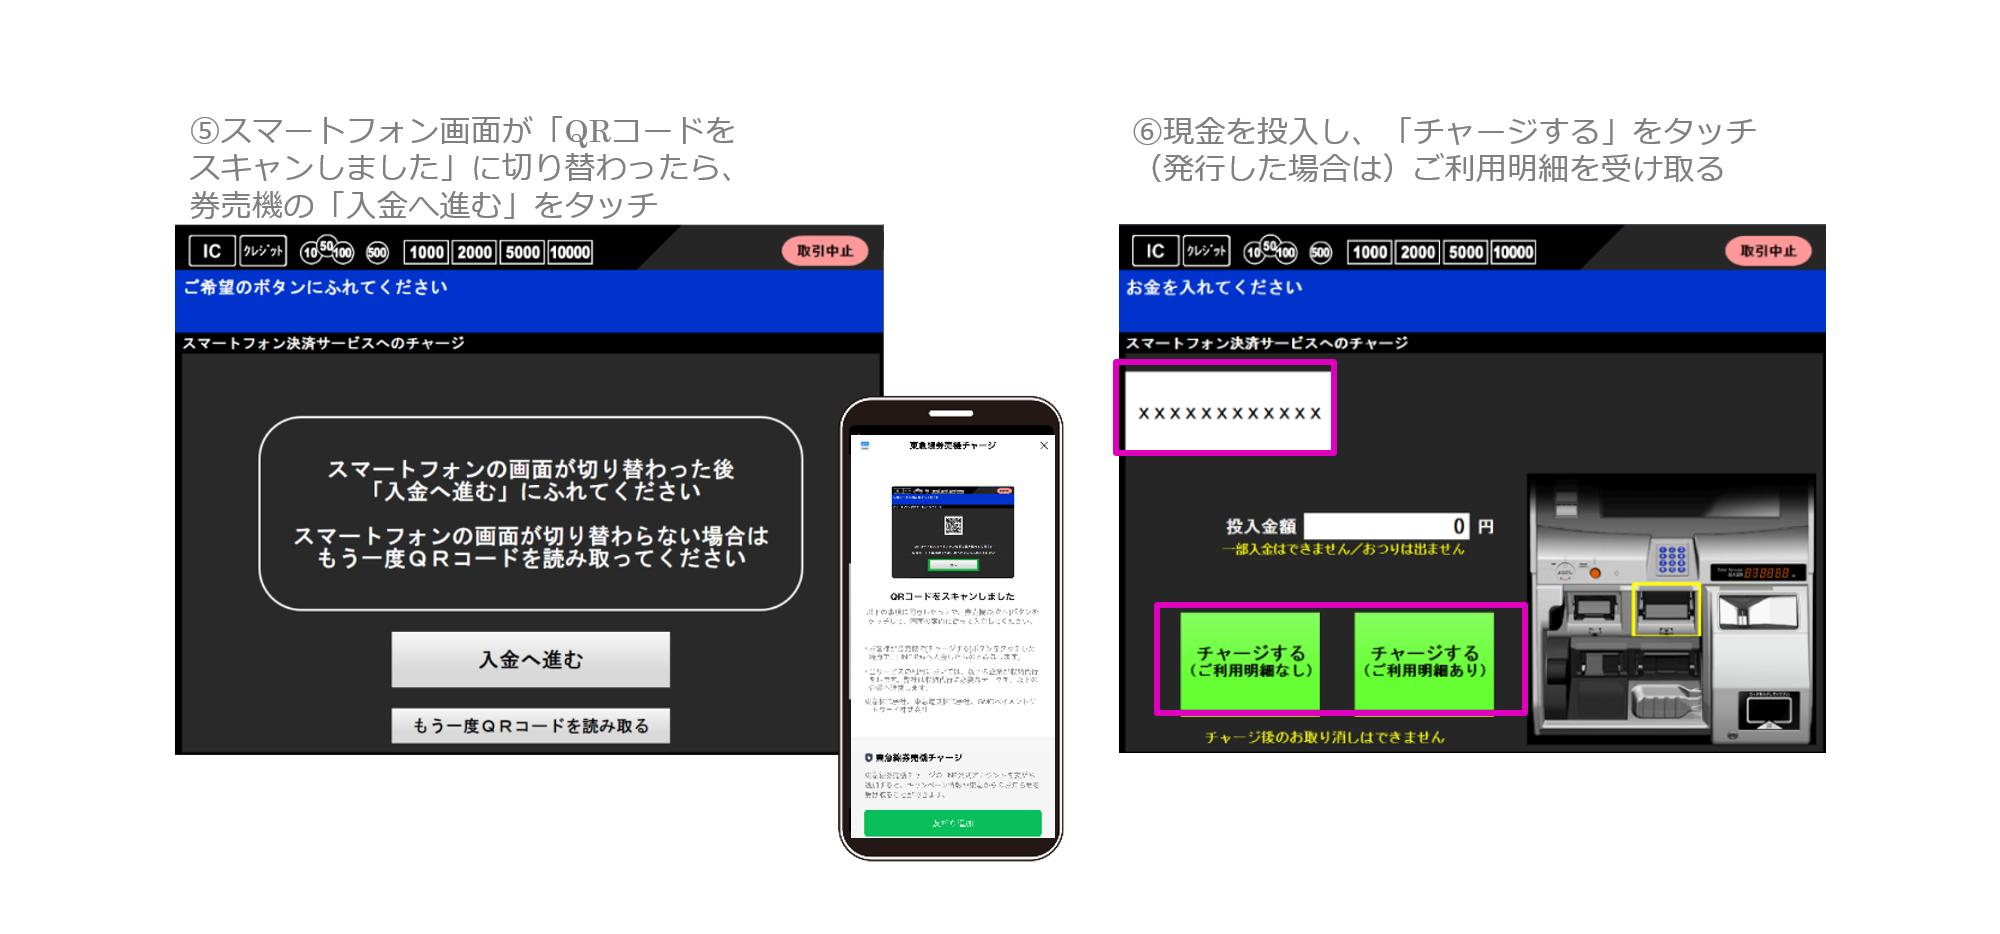 /stf/linecorp/ja/pr/tokyu_5,6.png